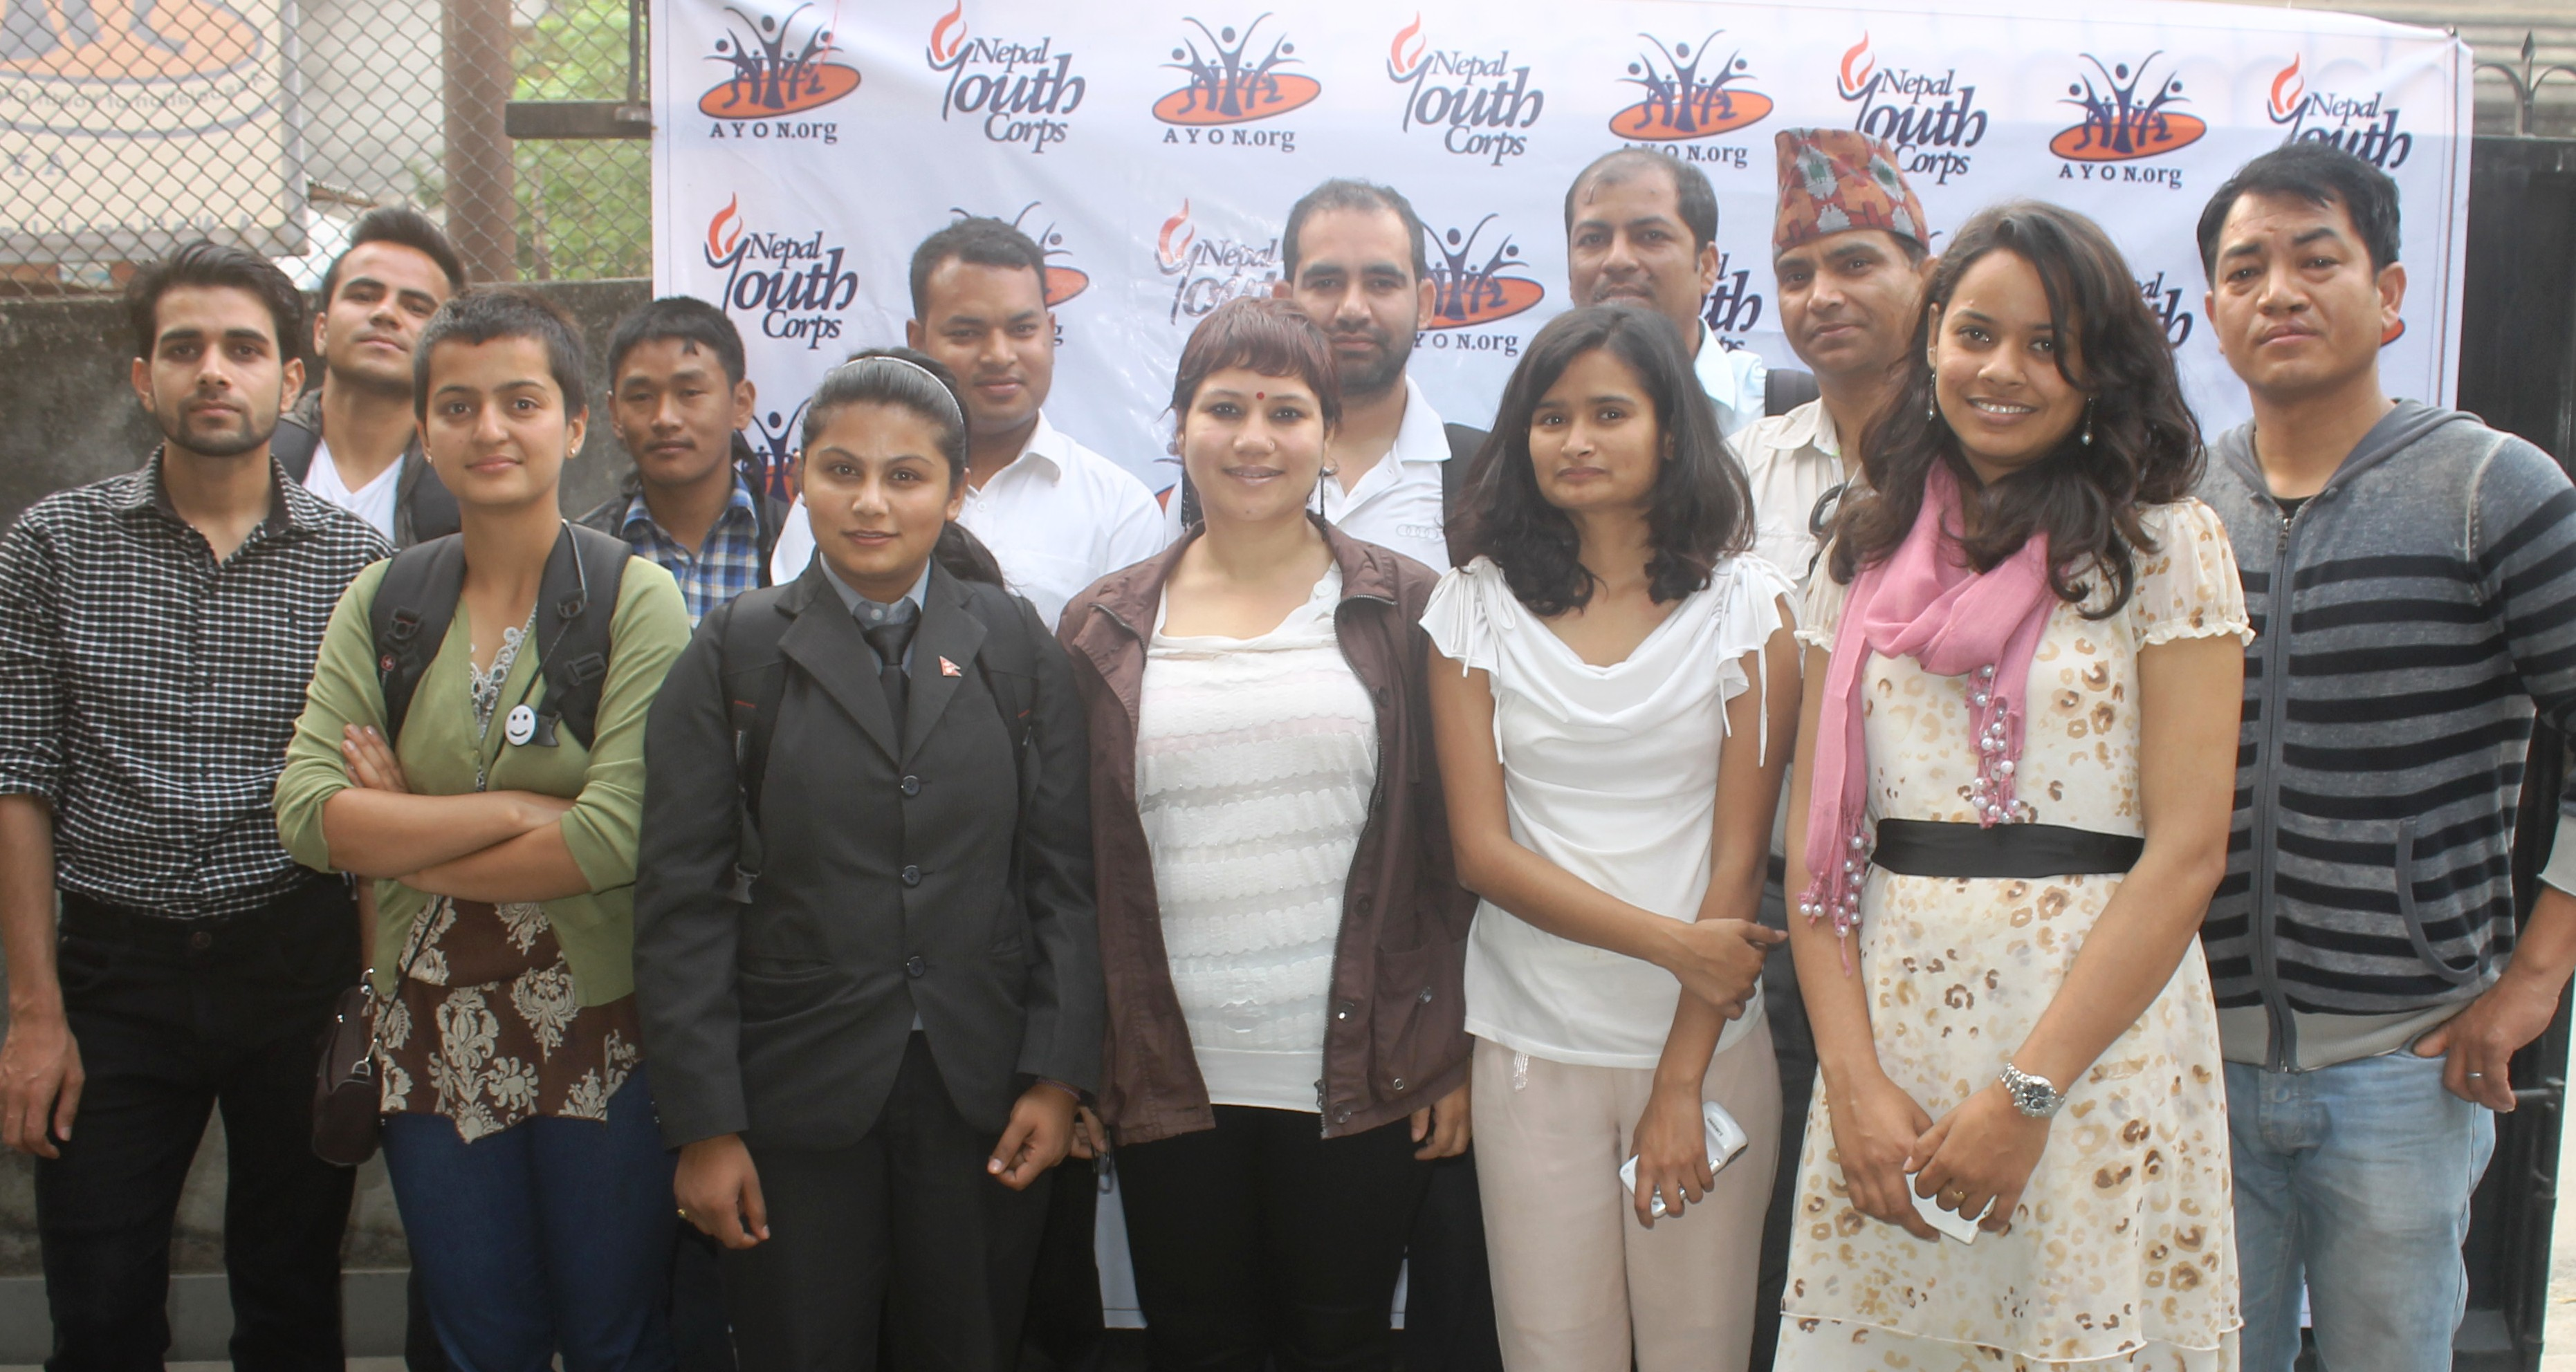 13 - Group photo